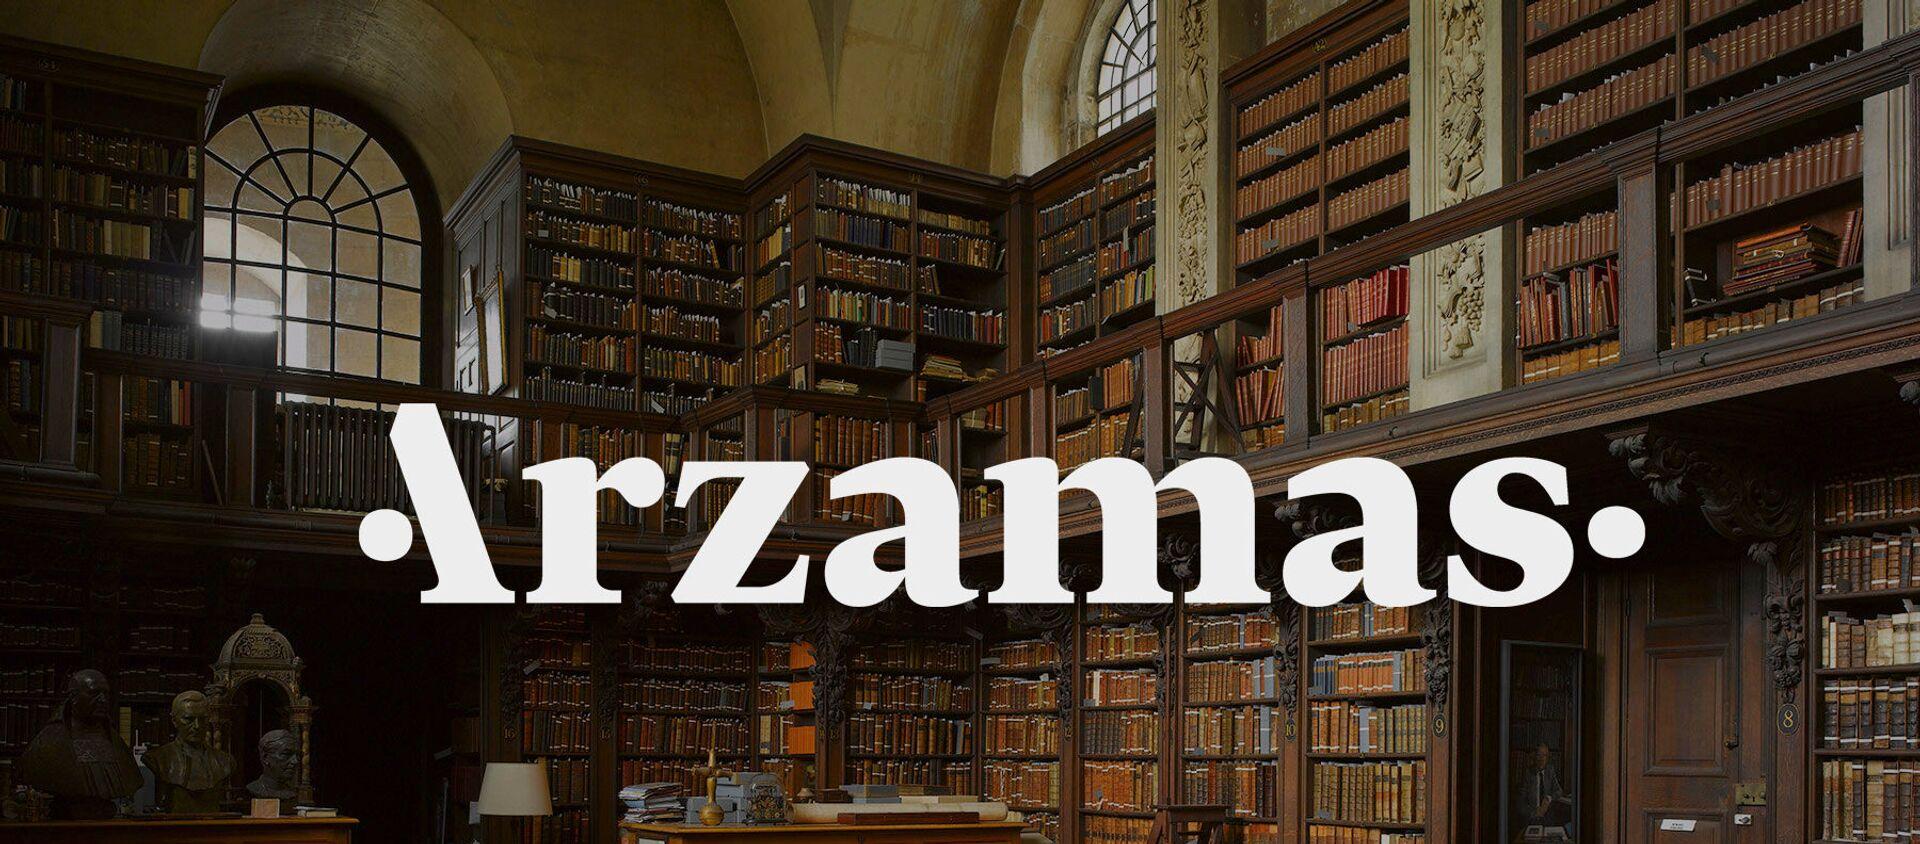 Пока все дома: топ-5 онлайн-курсов от радио Arzamas - Sputnik Азербайджан, 1920, 08.04.2020